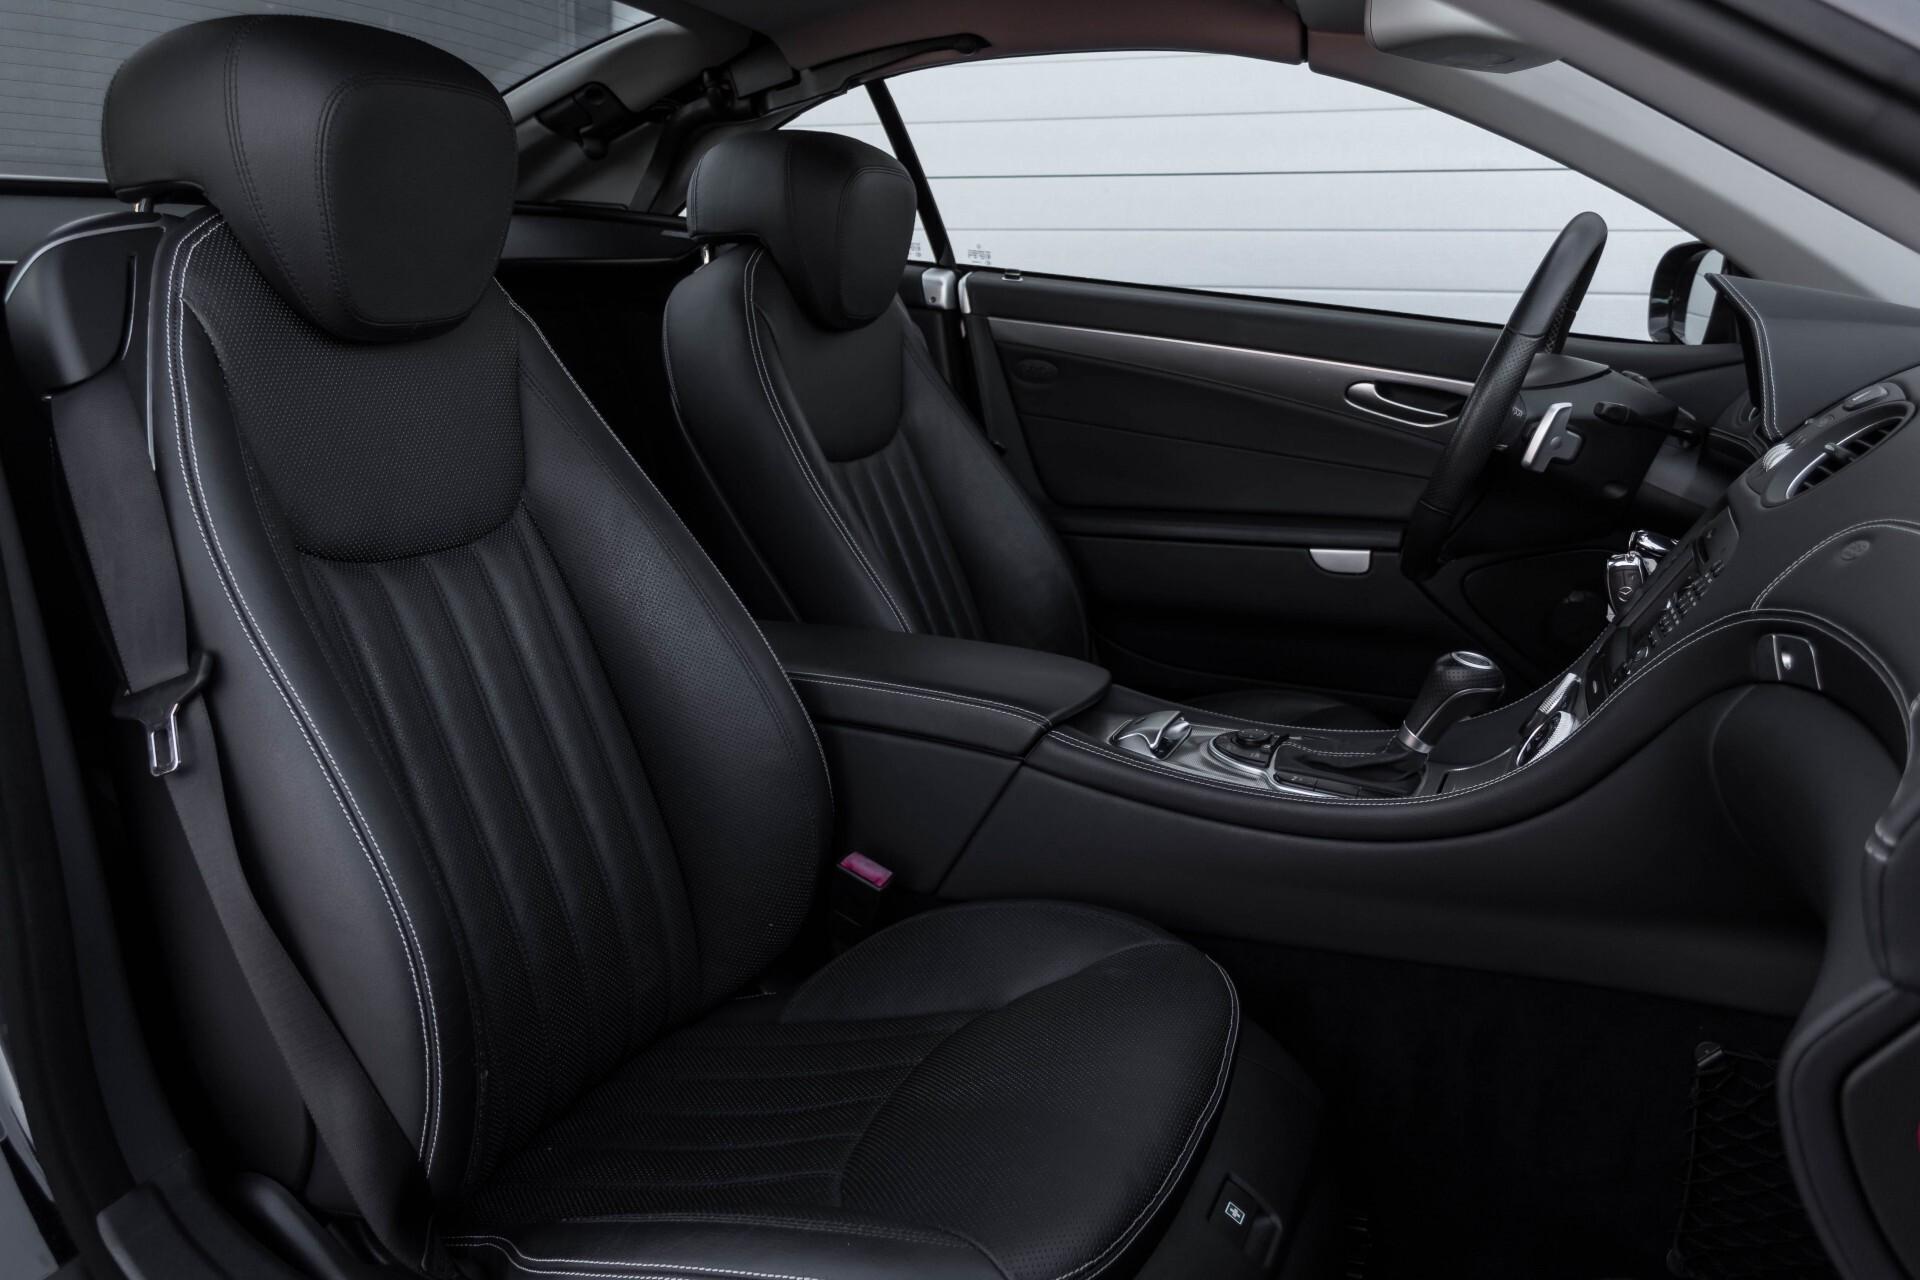 Mercedes-Benz SL-Klasse 500 Sport ABC/Harman-Kardon/Comand/Distronic Aut7 NP €175292 Foto 5